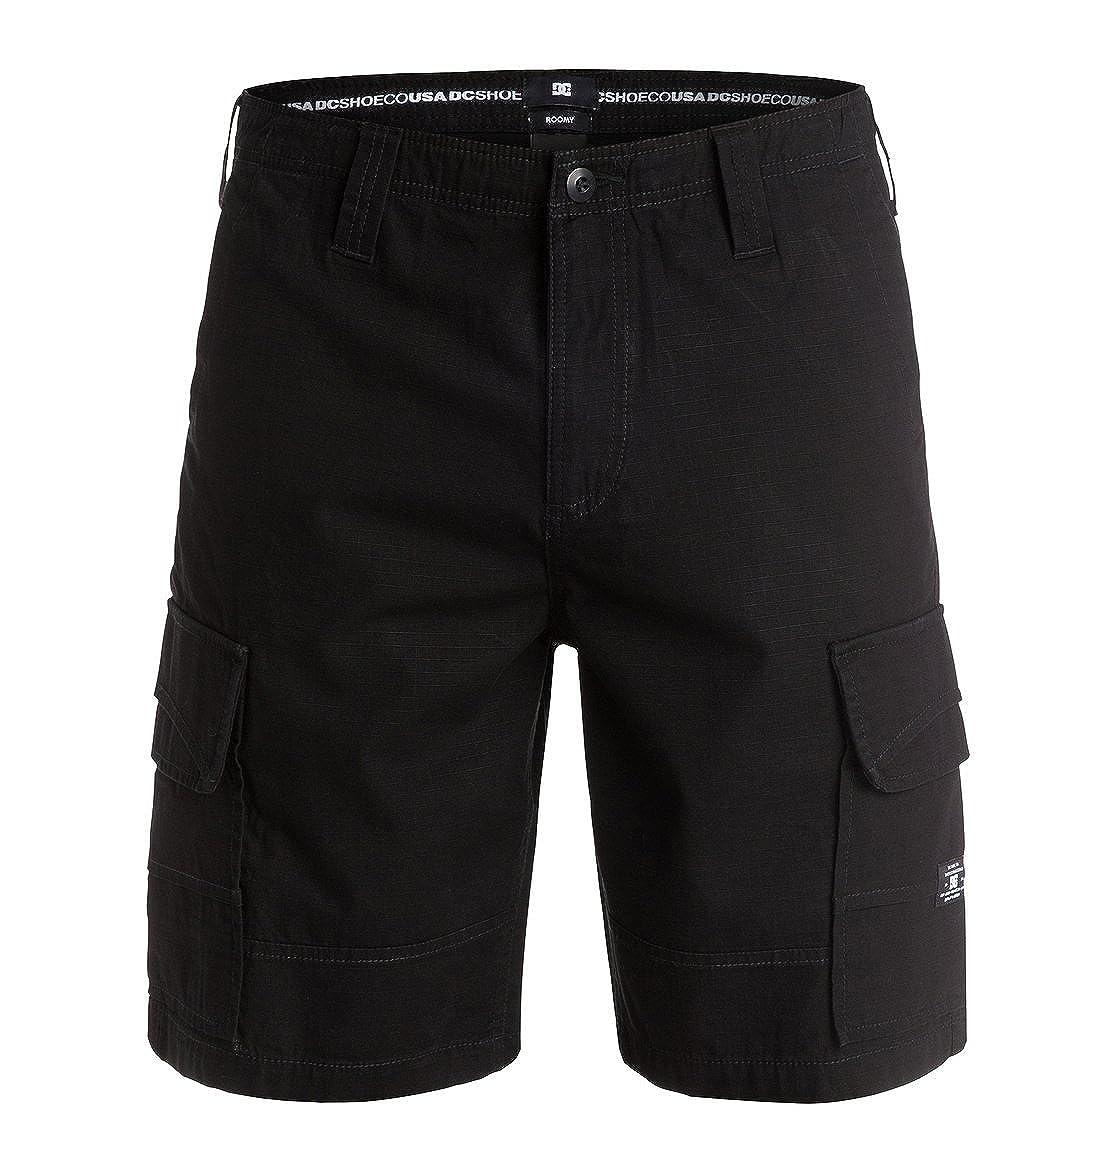 33 Shorts Grey Monument 33 DC Shoes Mens Shoes Ripstop Cargo 21 Men